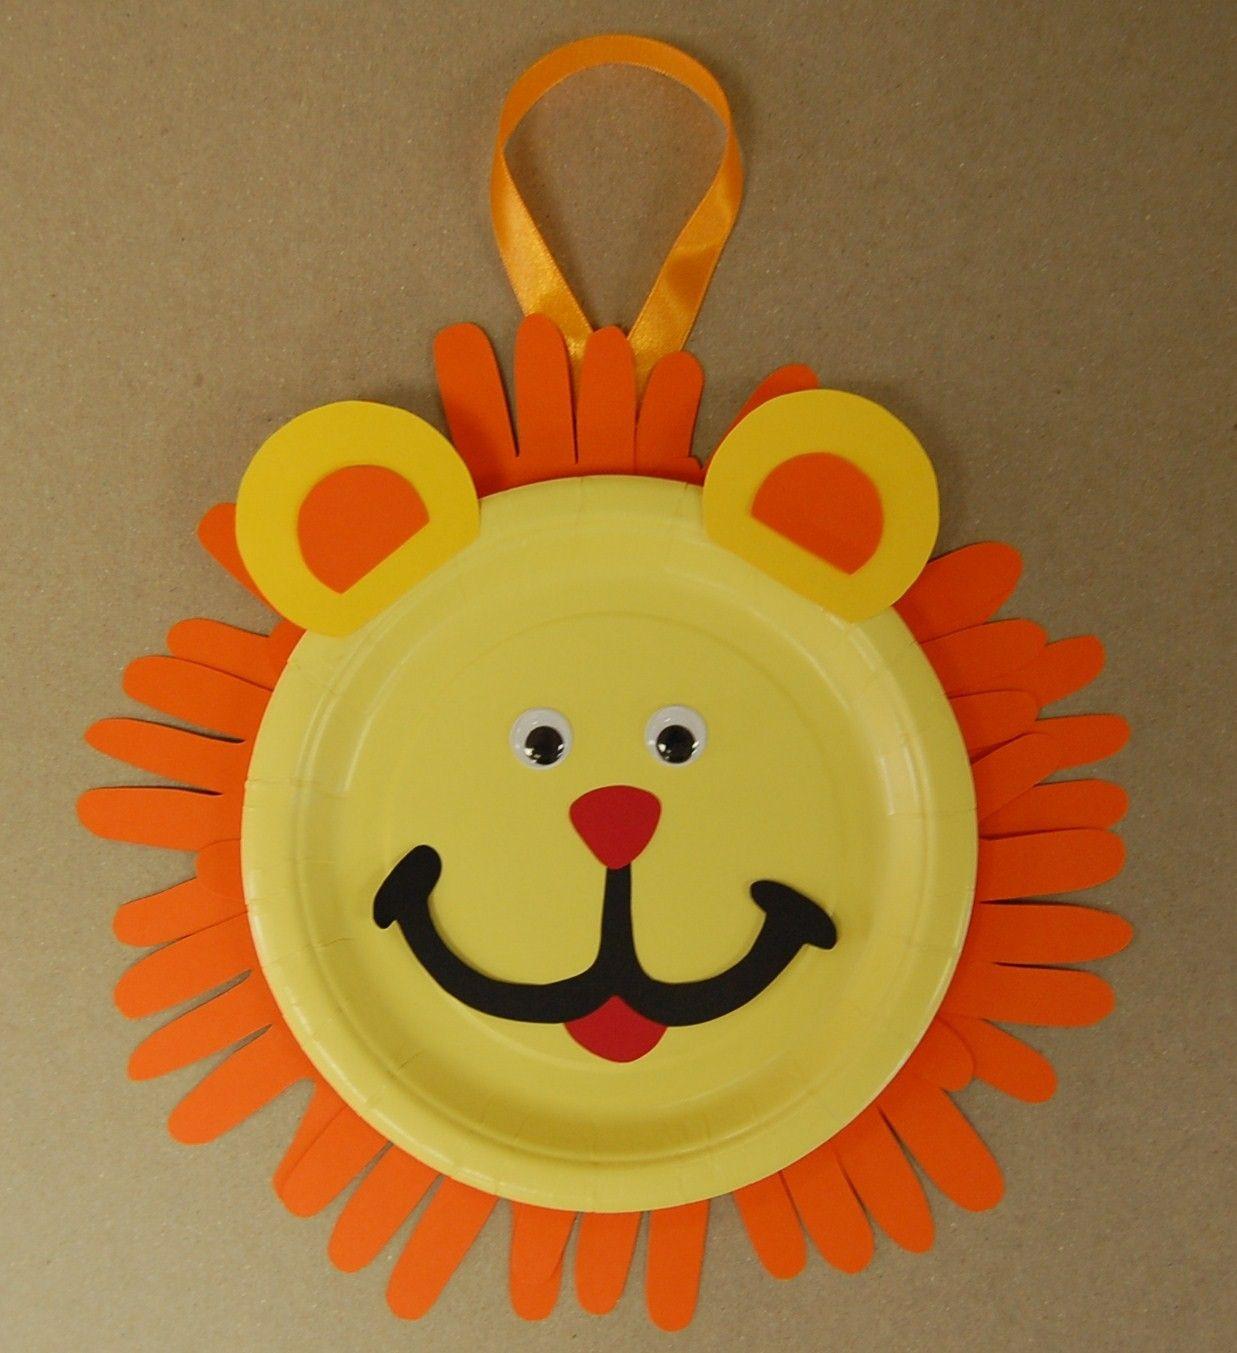 handprint crafts clearance lion handprint keepsake craft kit by